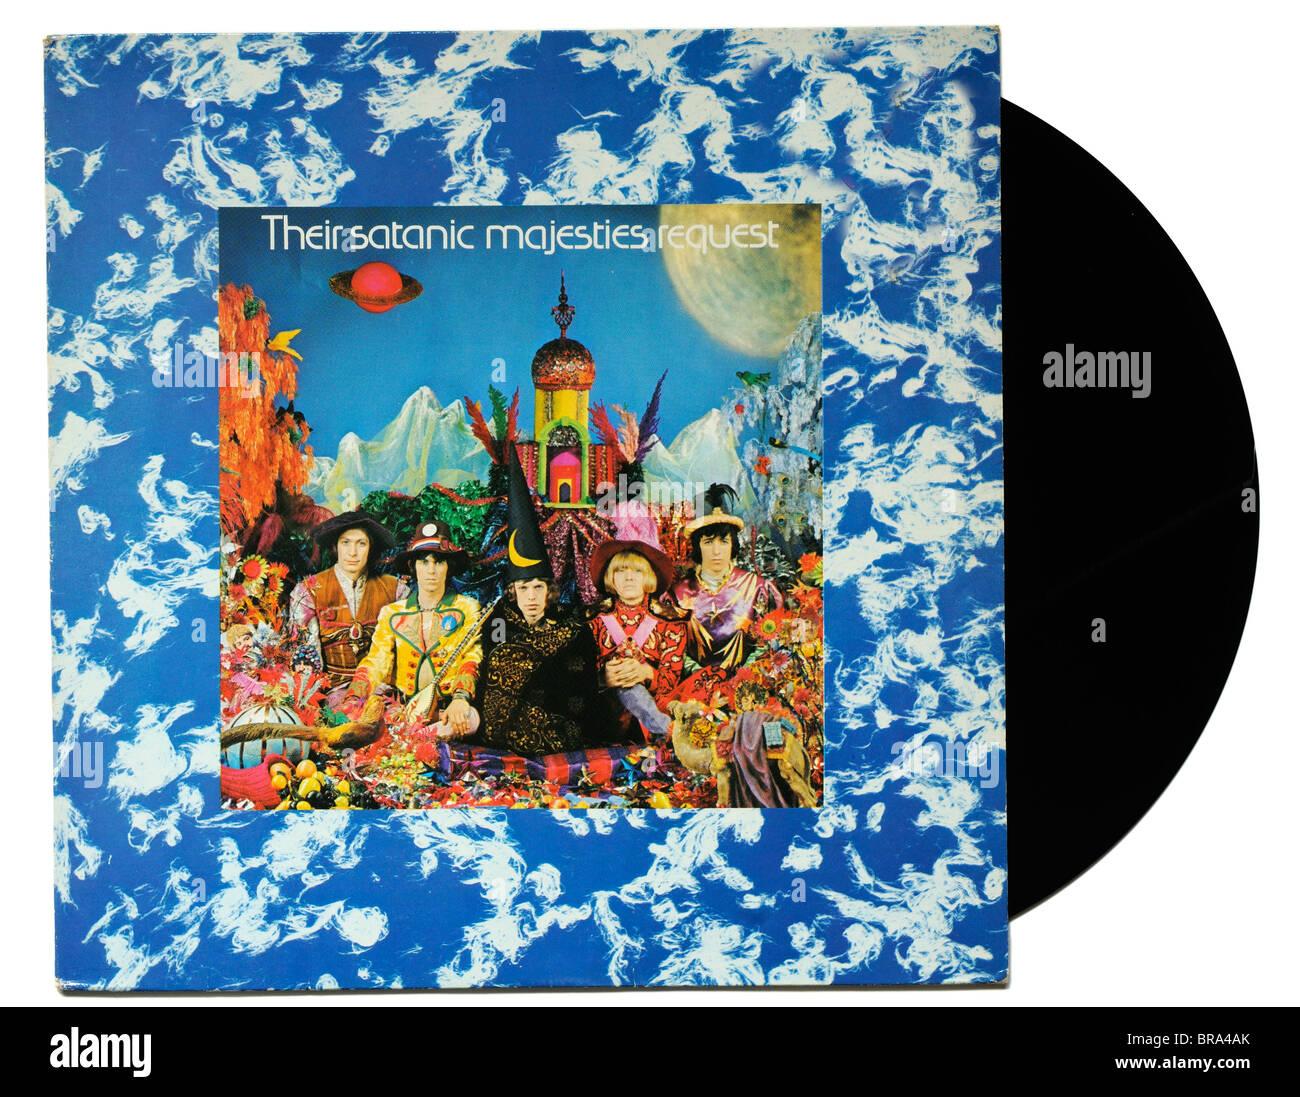 Rolling Stones Their Satanic Majesties Request Album Stock